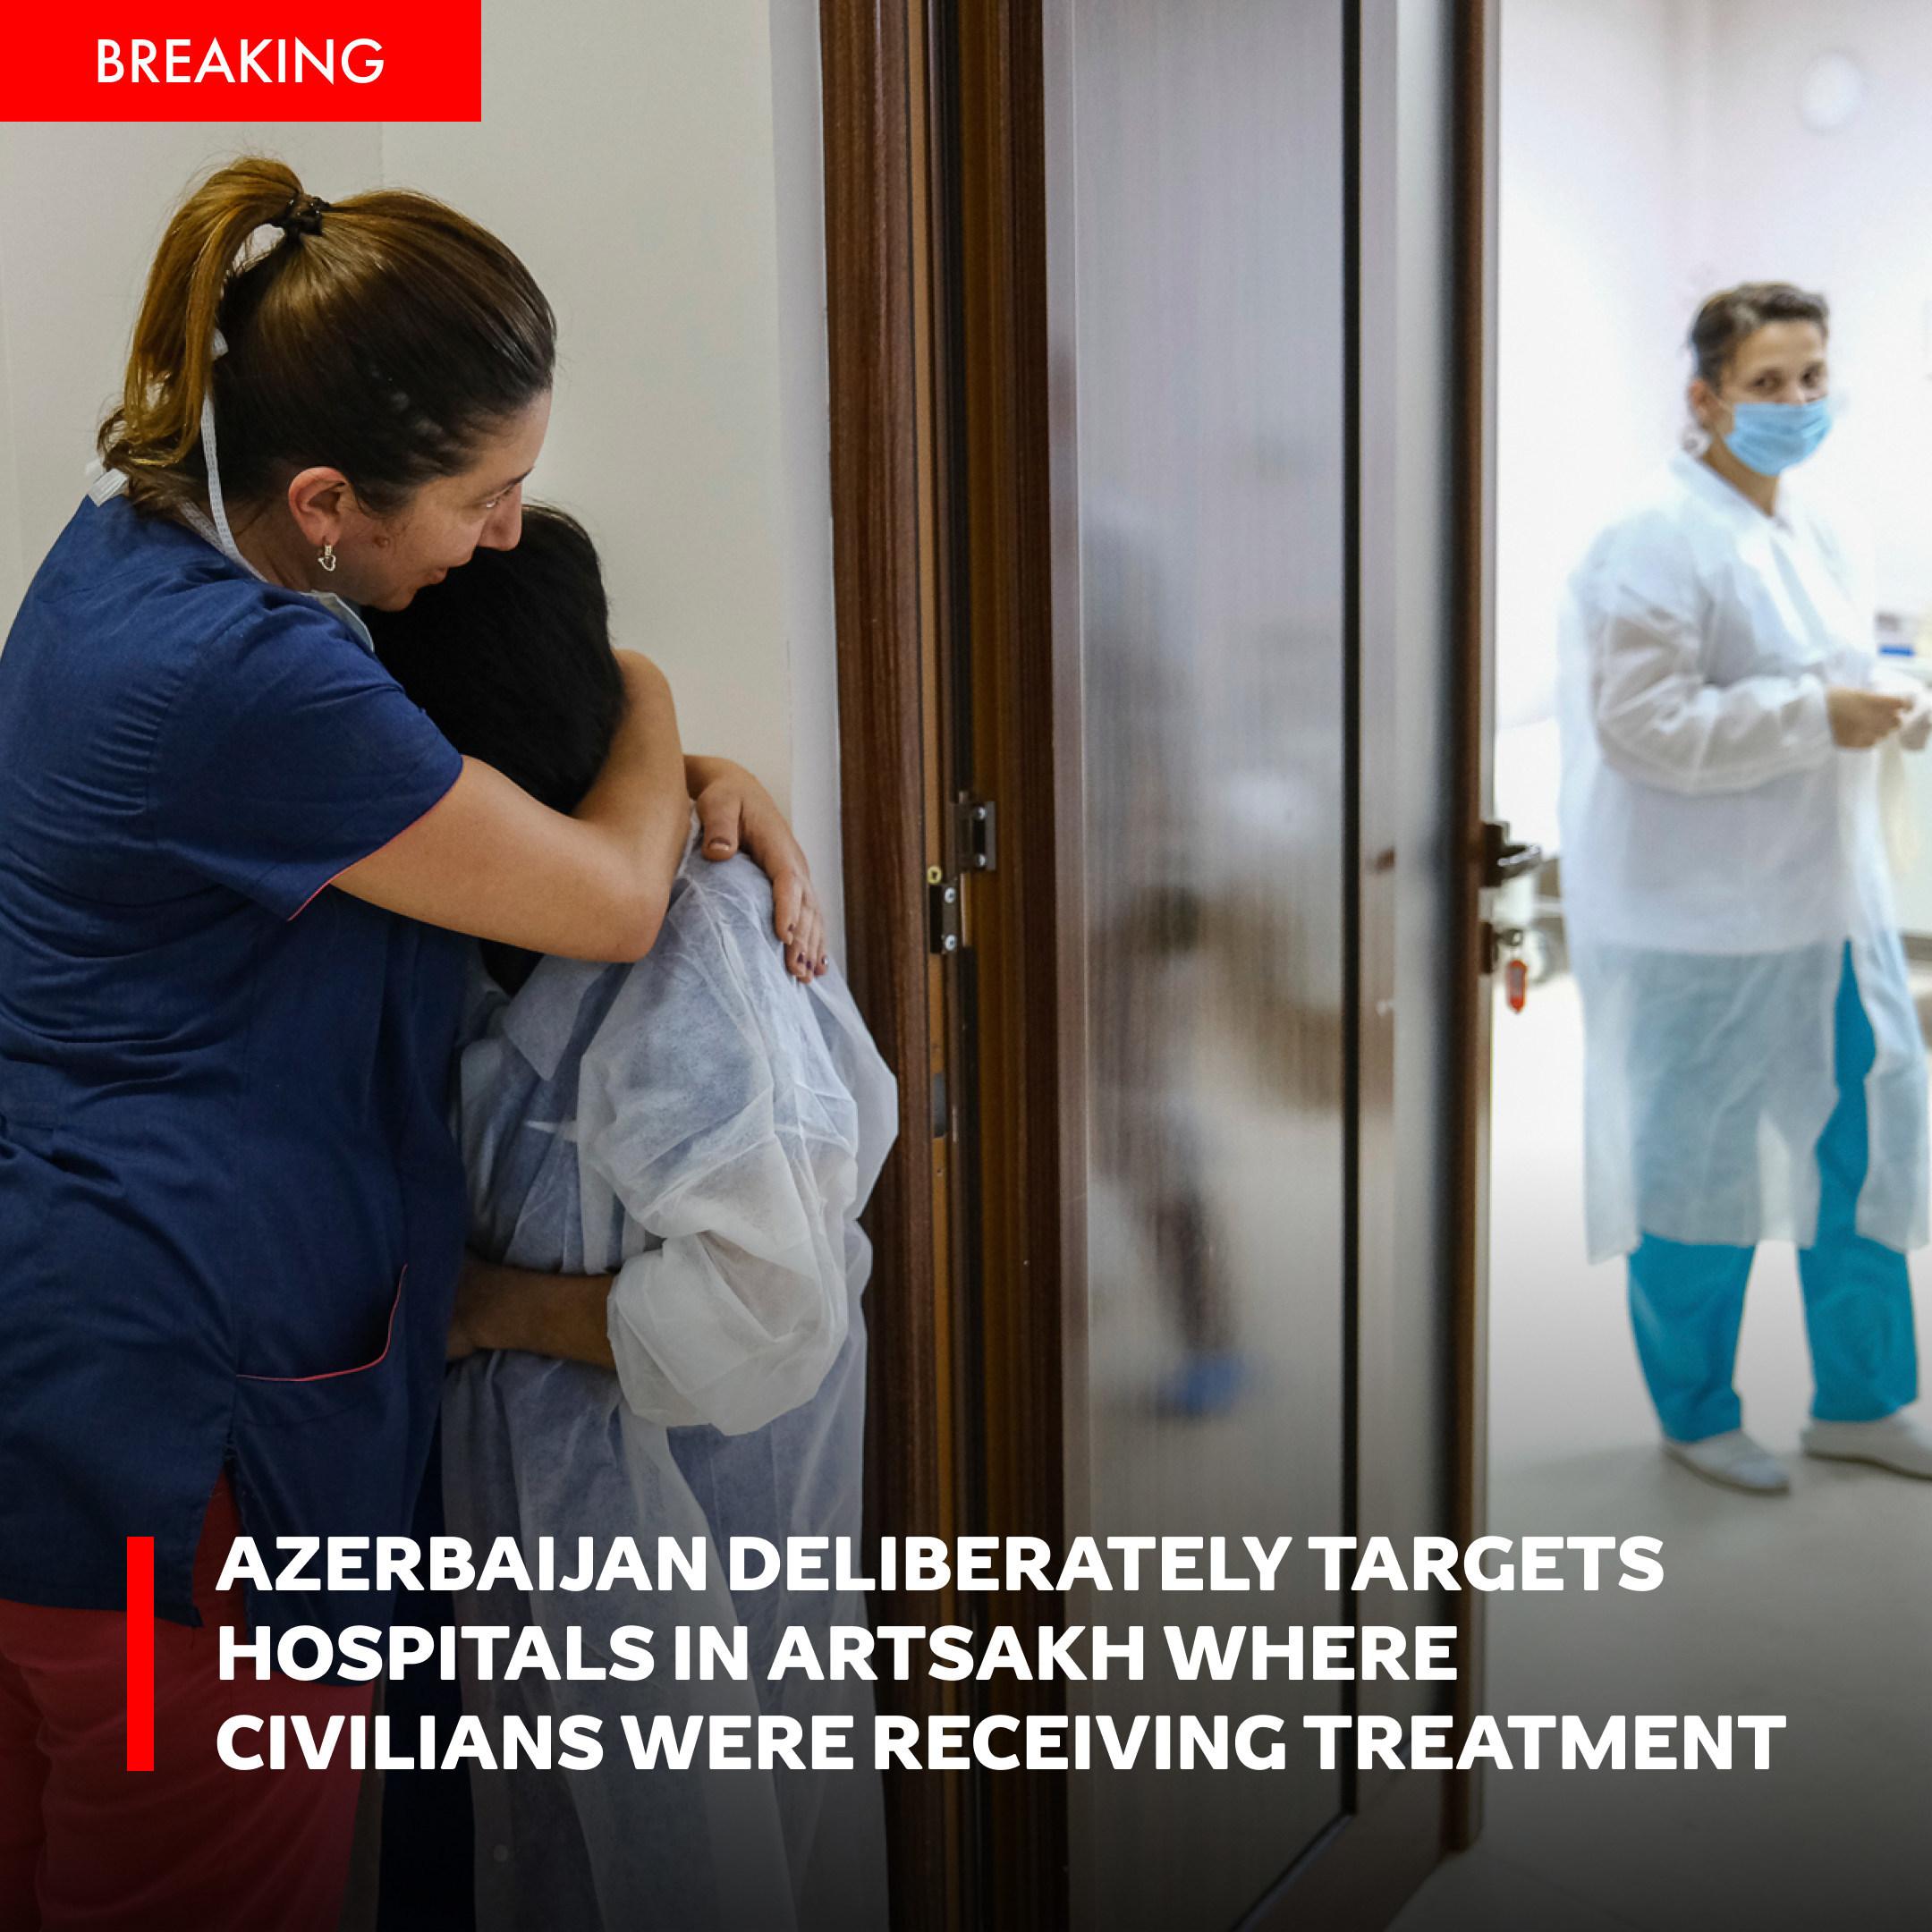 Global Awareness Initiative Reports Azerbaijan Deliberately Targets Hospitals And Kindergartens In Nagorno Karabakh